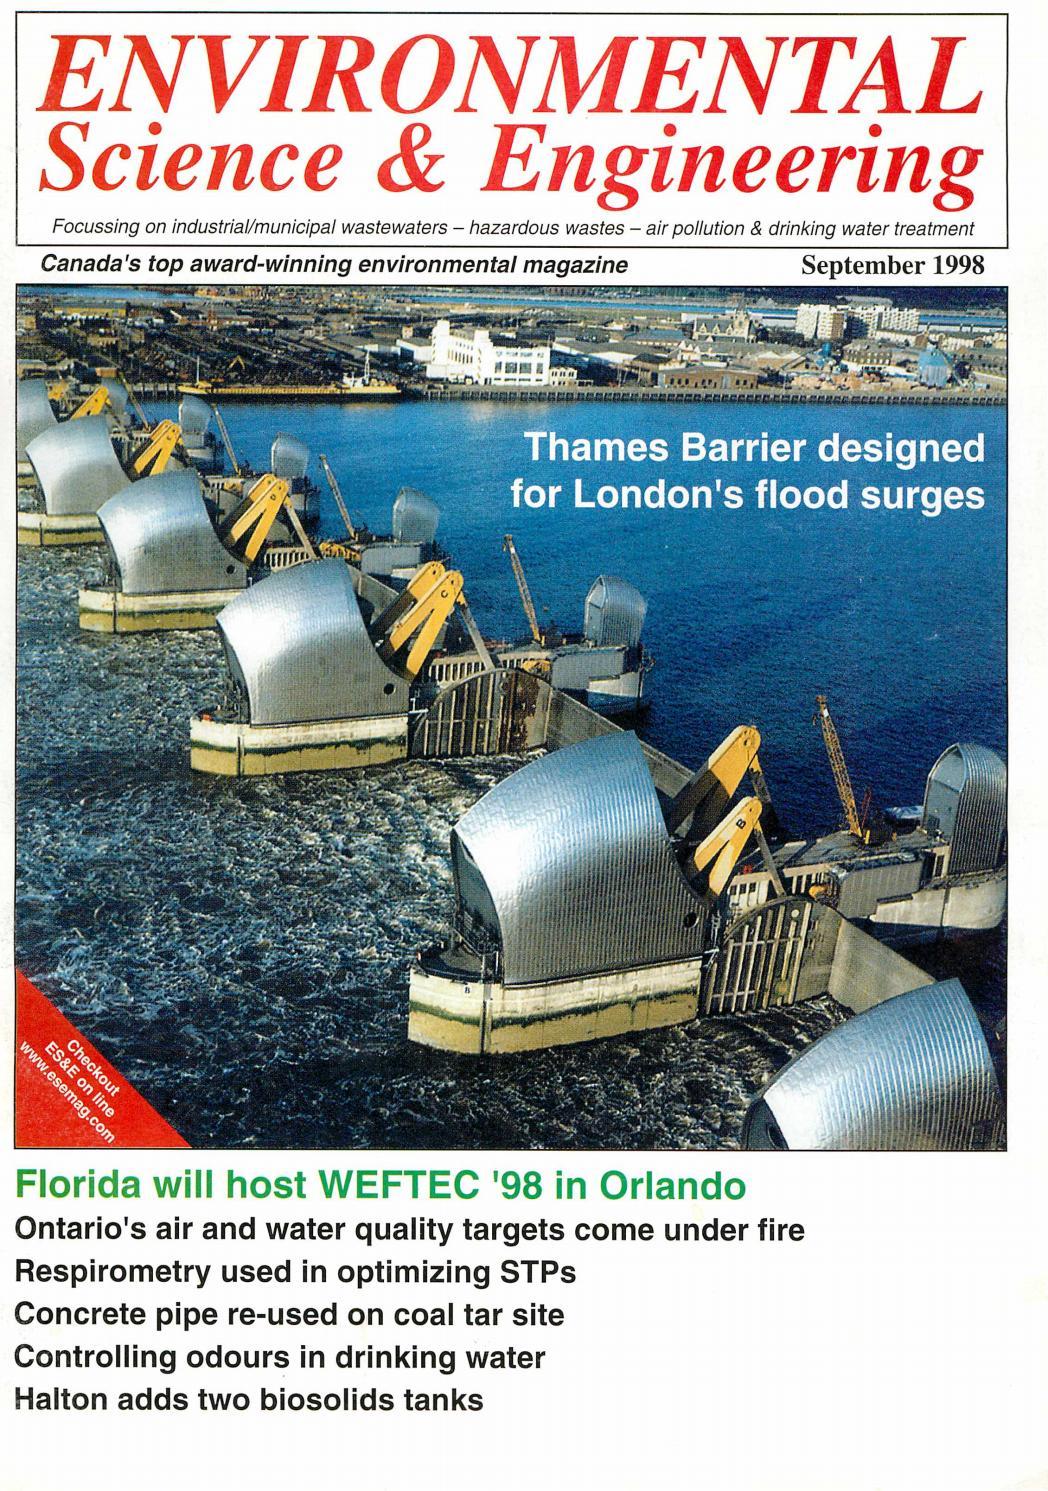 Environmental Science & Engineering Magazine (ESEMAG) September 1998 ...